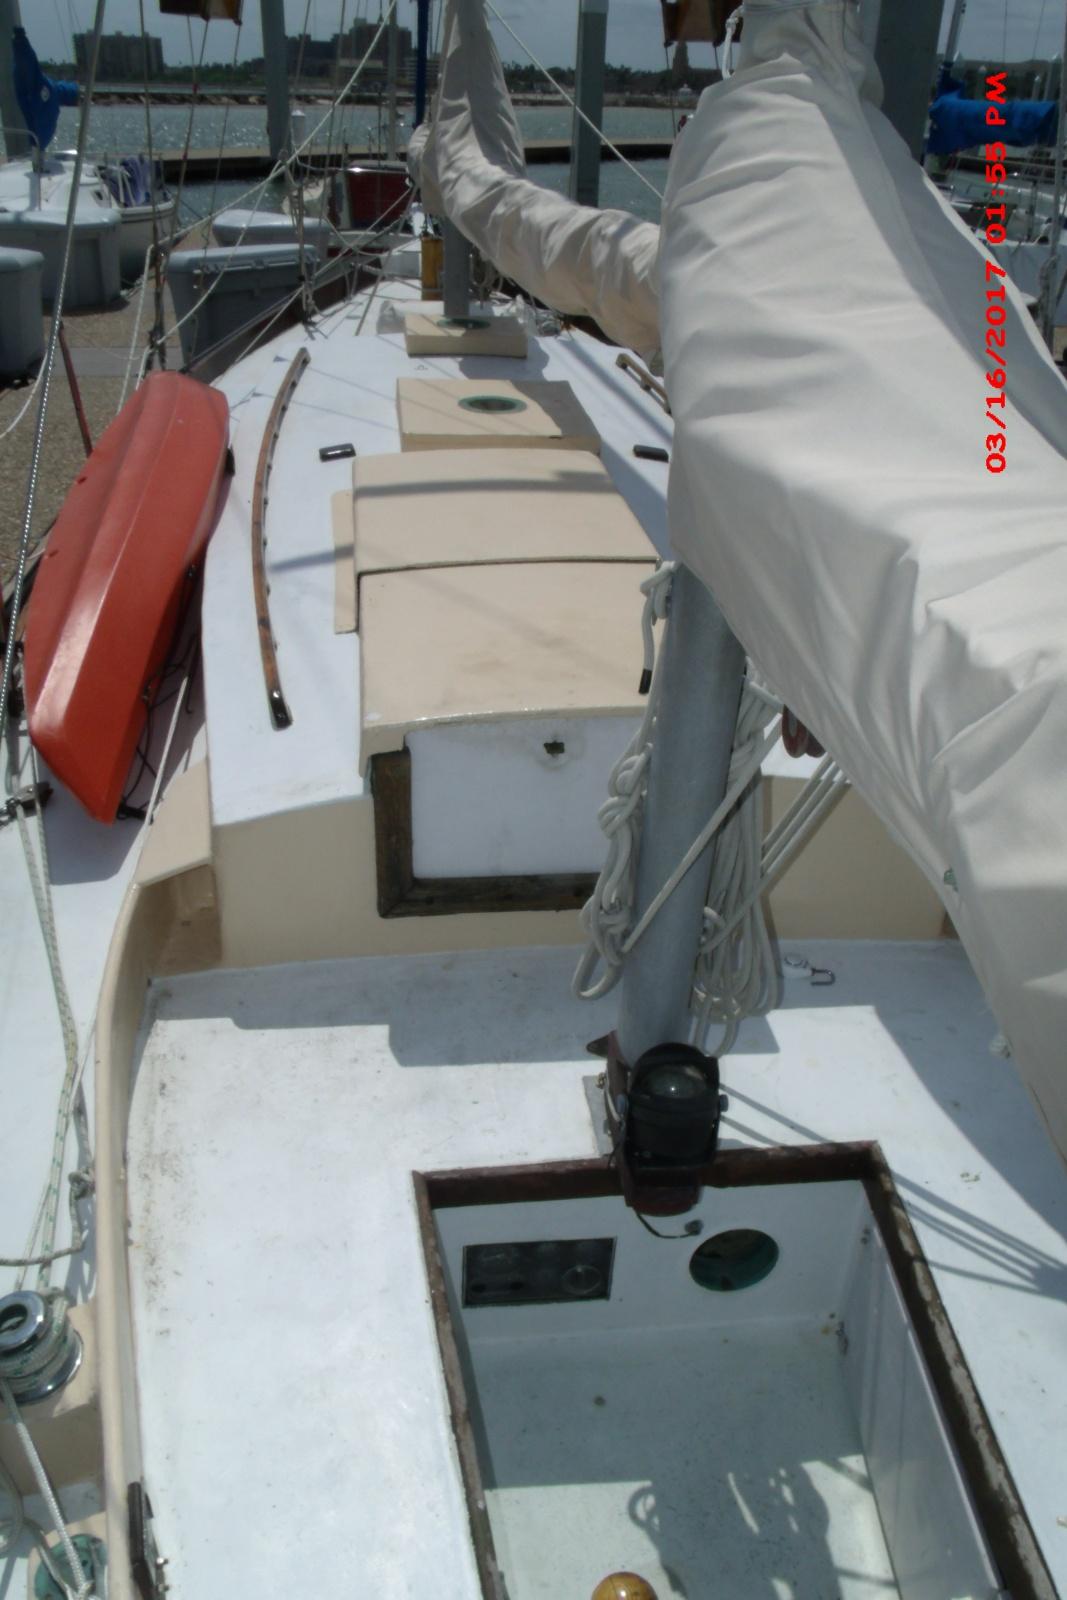 Click image for larger version  Name:cockpit.jpg Views:130 Size:379.8 KB ID:161806